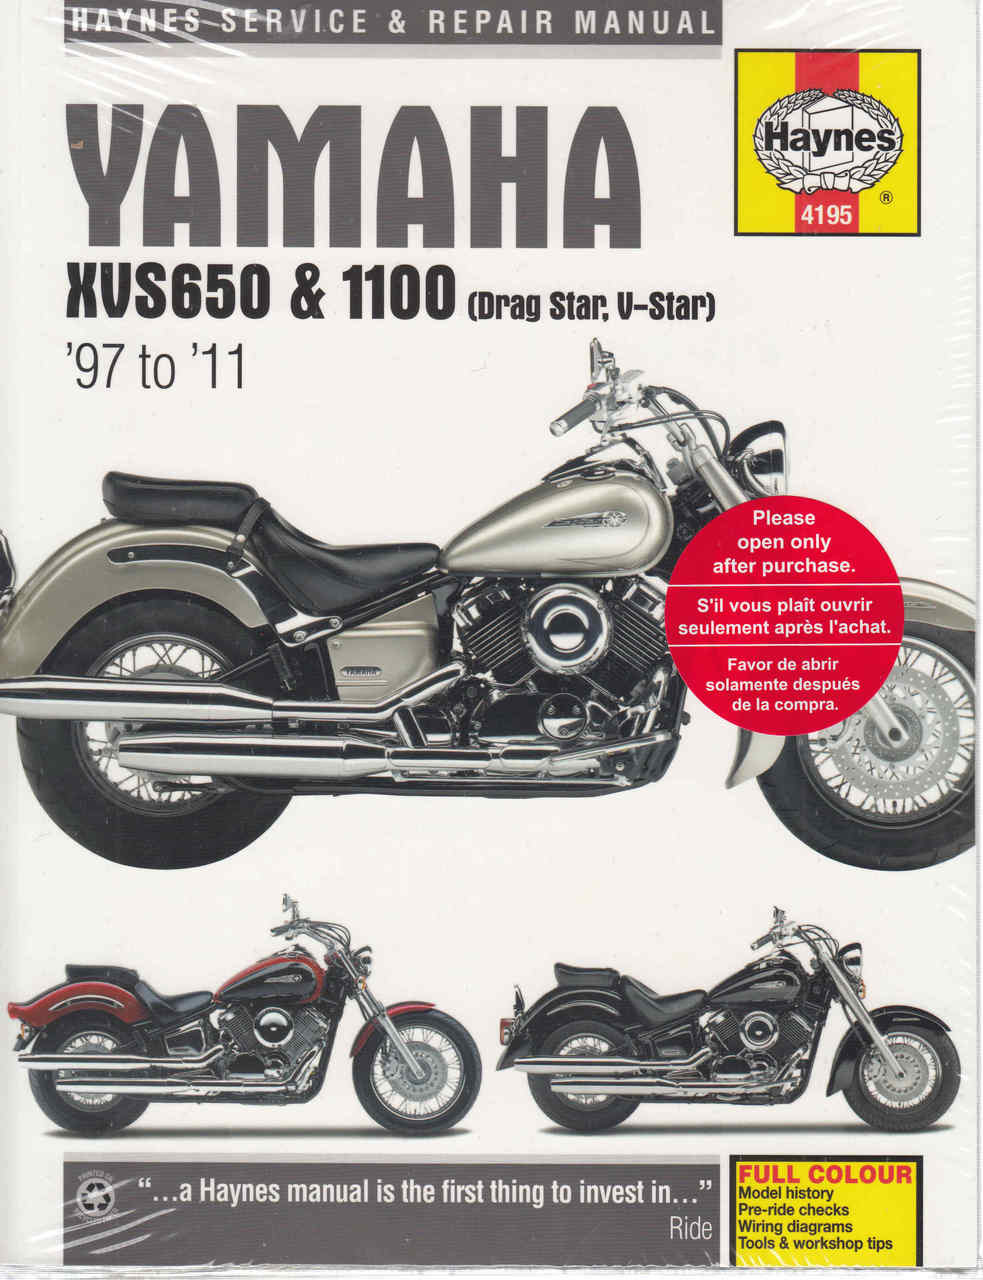 medium resolution of yamaha xvs650 and xvs1100 drag star v star 1997 2011 workshop manual